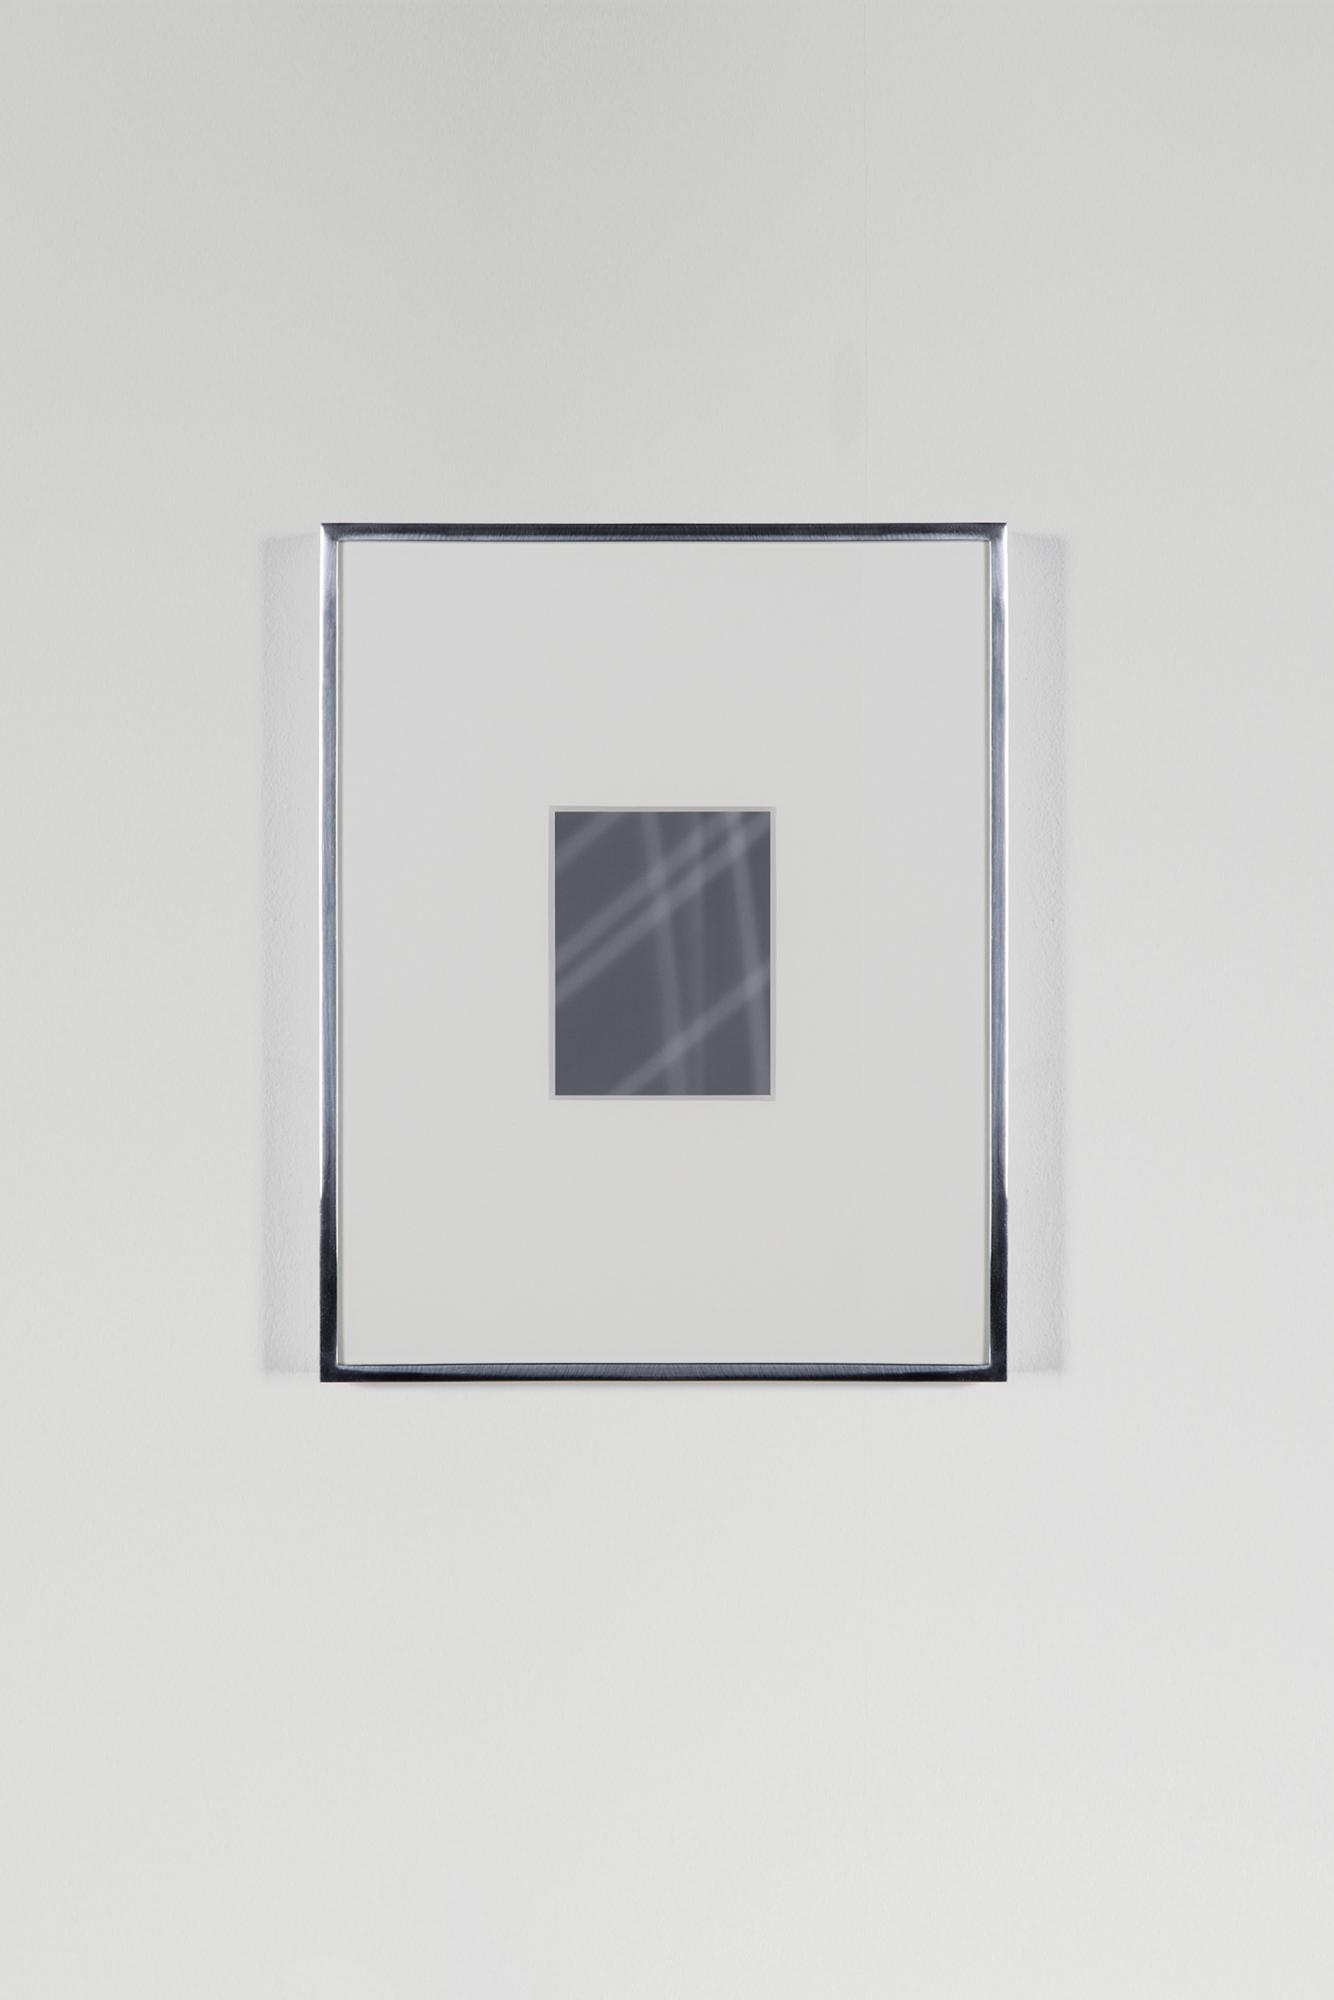 Transparency (Negative) [Kodak Portra 400NC Em. No. 1022: July 8–10, 2015 LAX/JFK JFK/LAX]    2017   Epson Ultrachrome K3 archival ink jet print on Museo Silver Rag Paper  14 x 11 inches   Transparencies, 2014–